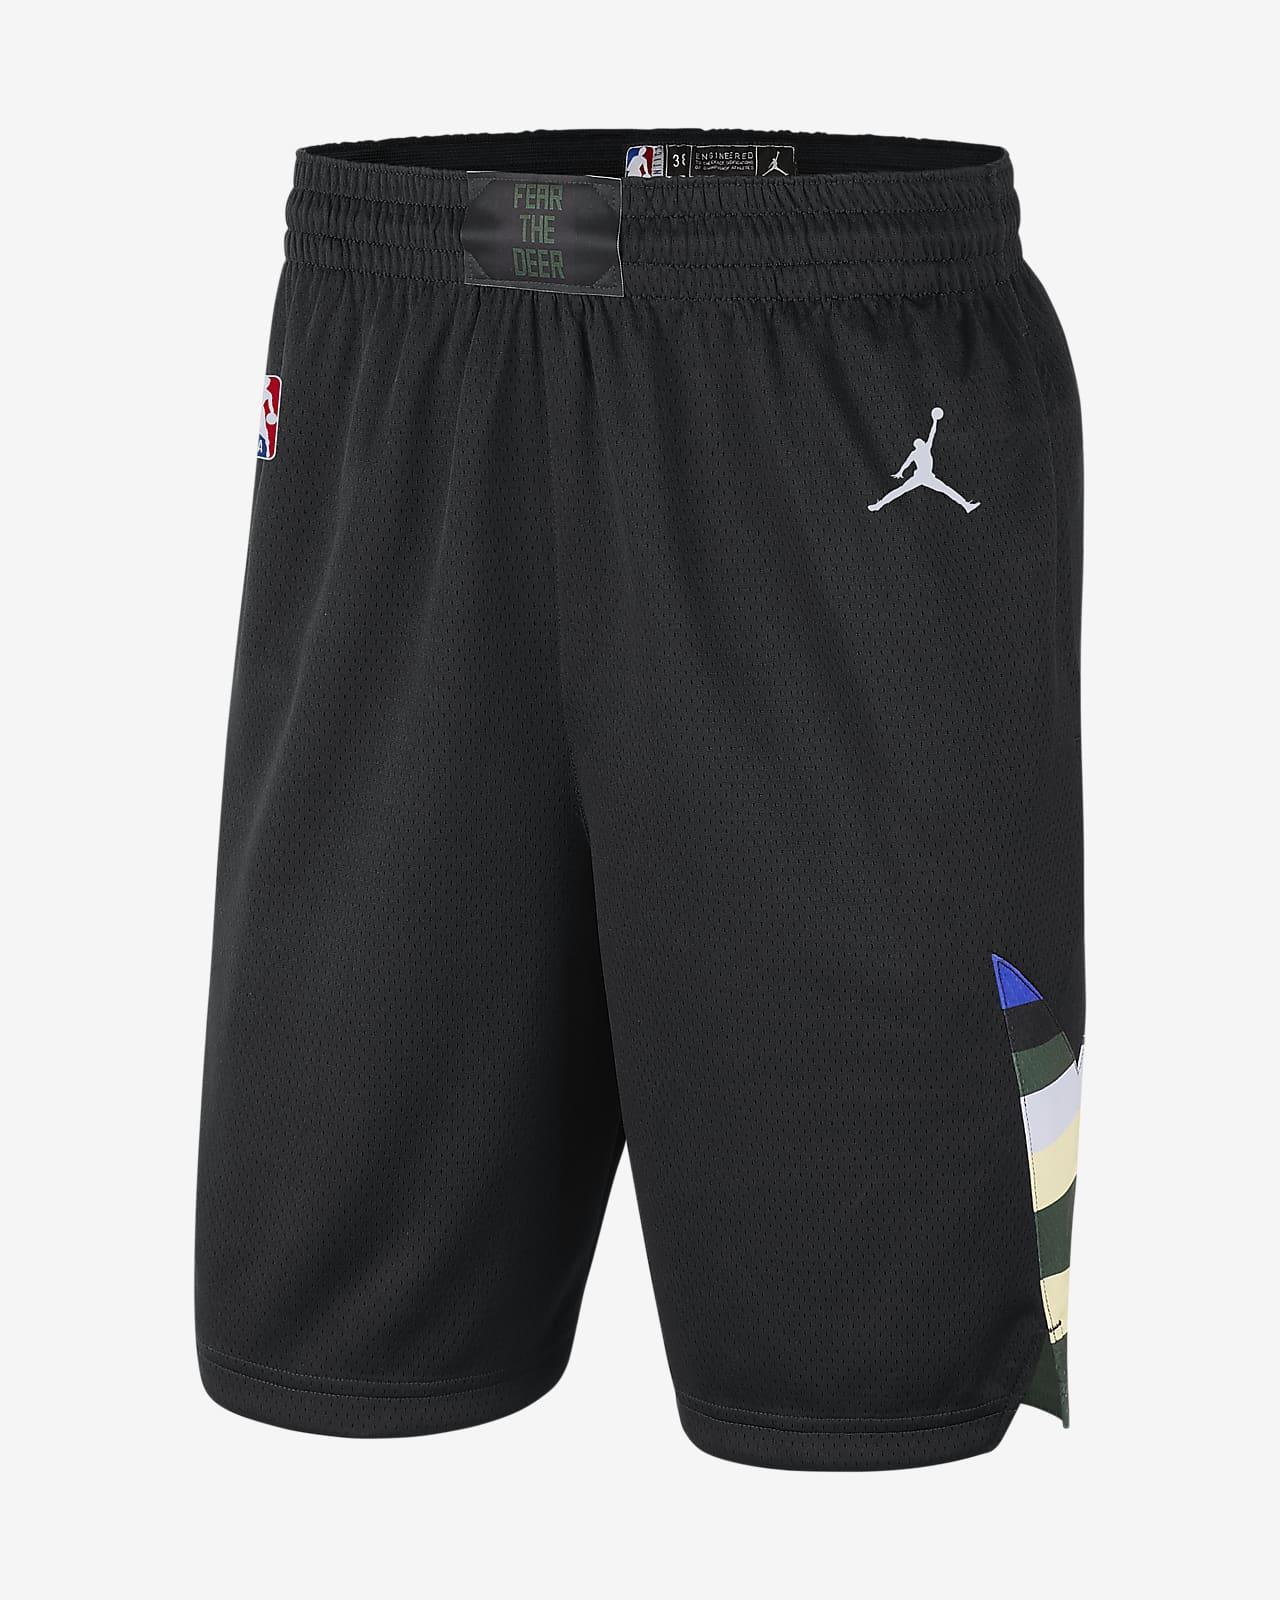 Bucks Statement Edition 2020 Jordan NBA Swingman Shorts für Herren